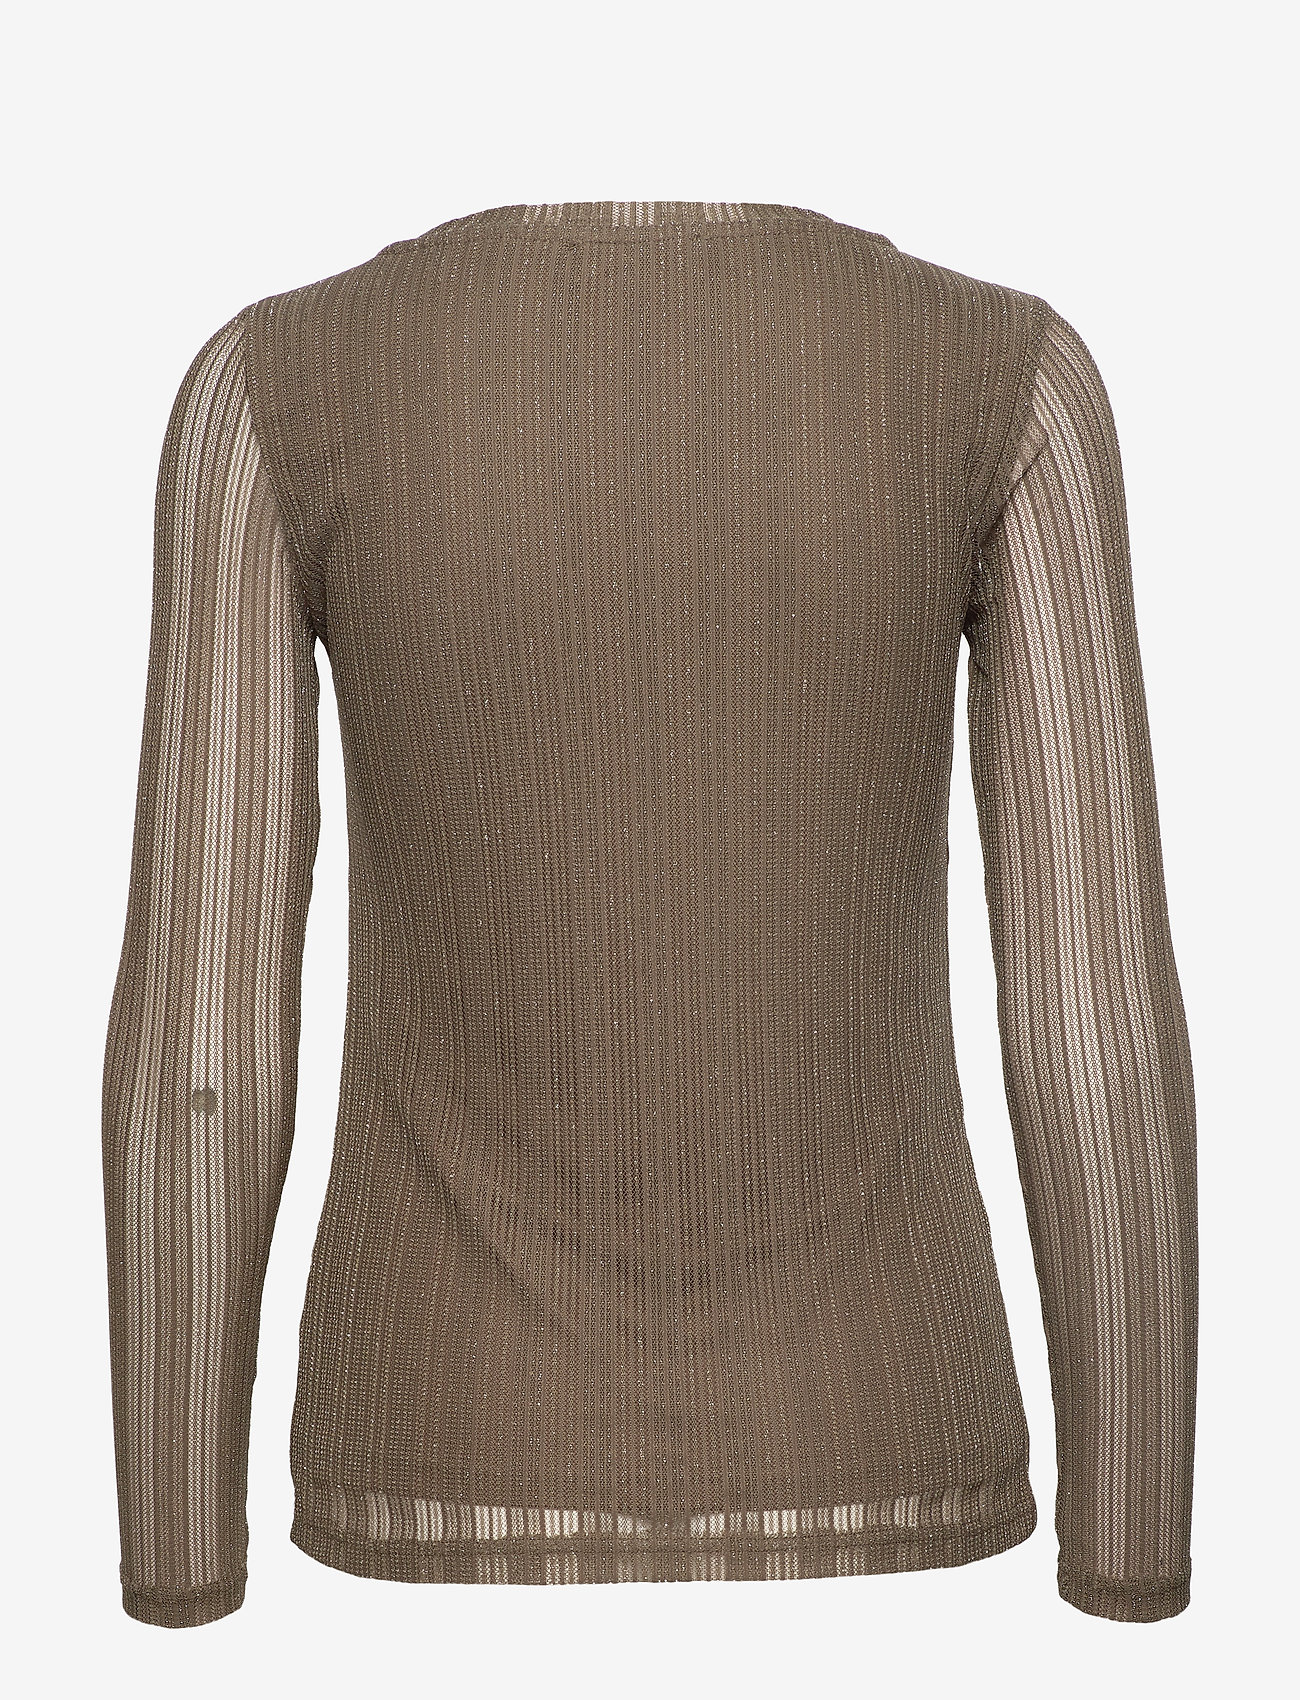 Zoecr Long Sleeve T-shirt (Sea Green) (29.98 €) - Cream Z8Iwb